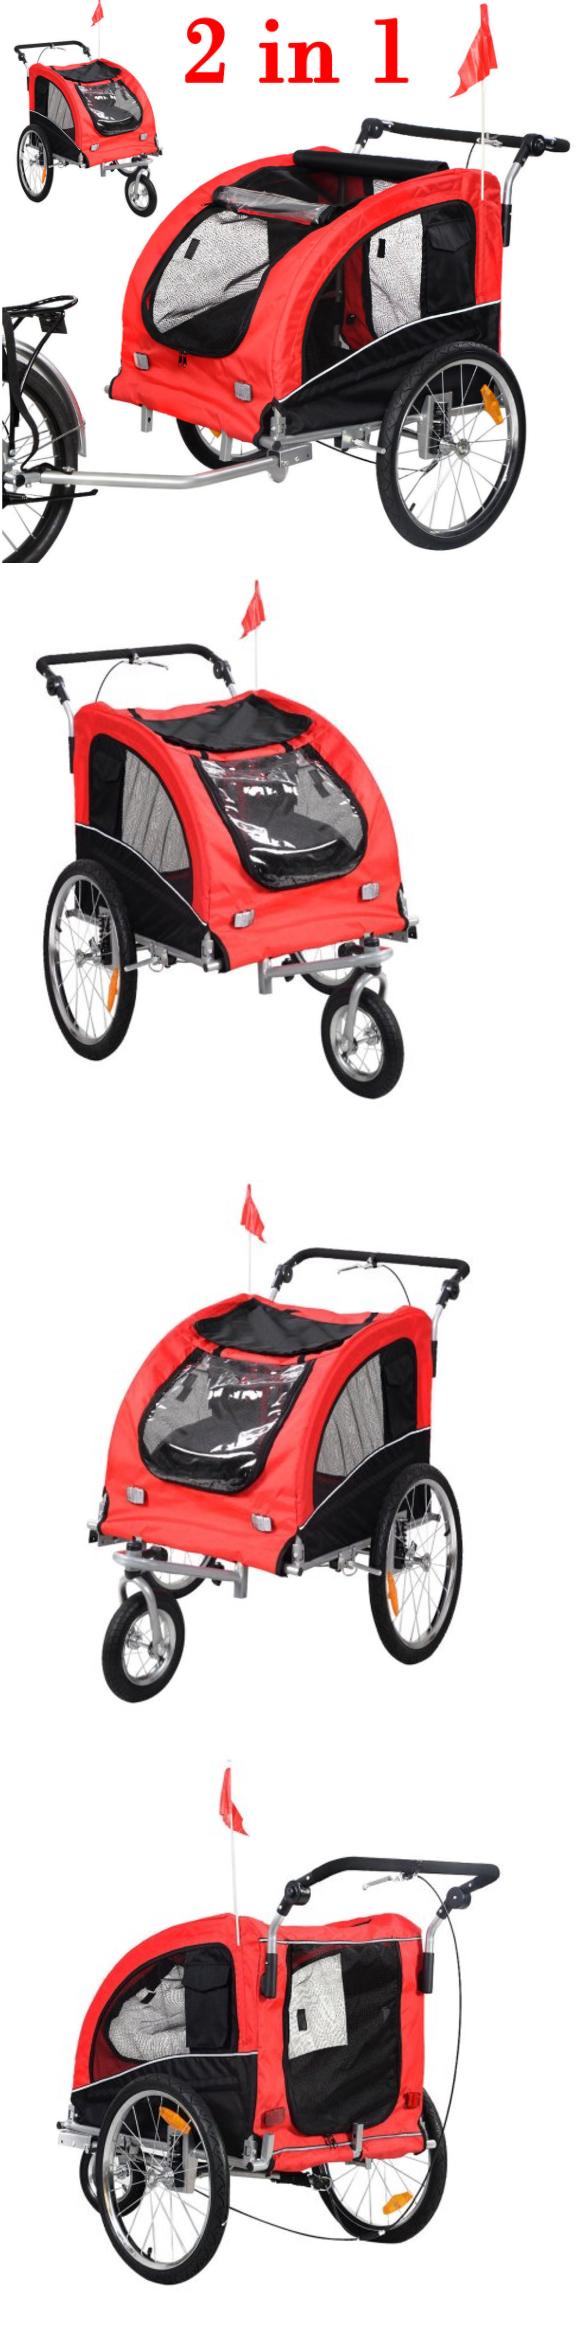 Bike baskets and trailers bike trailer dog bicycle pet